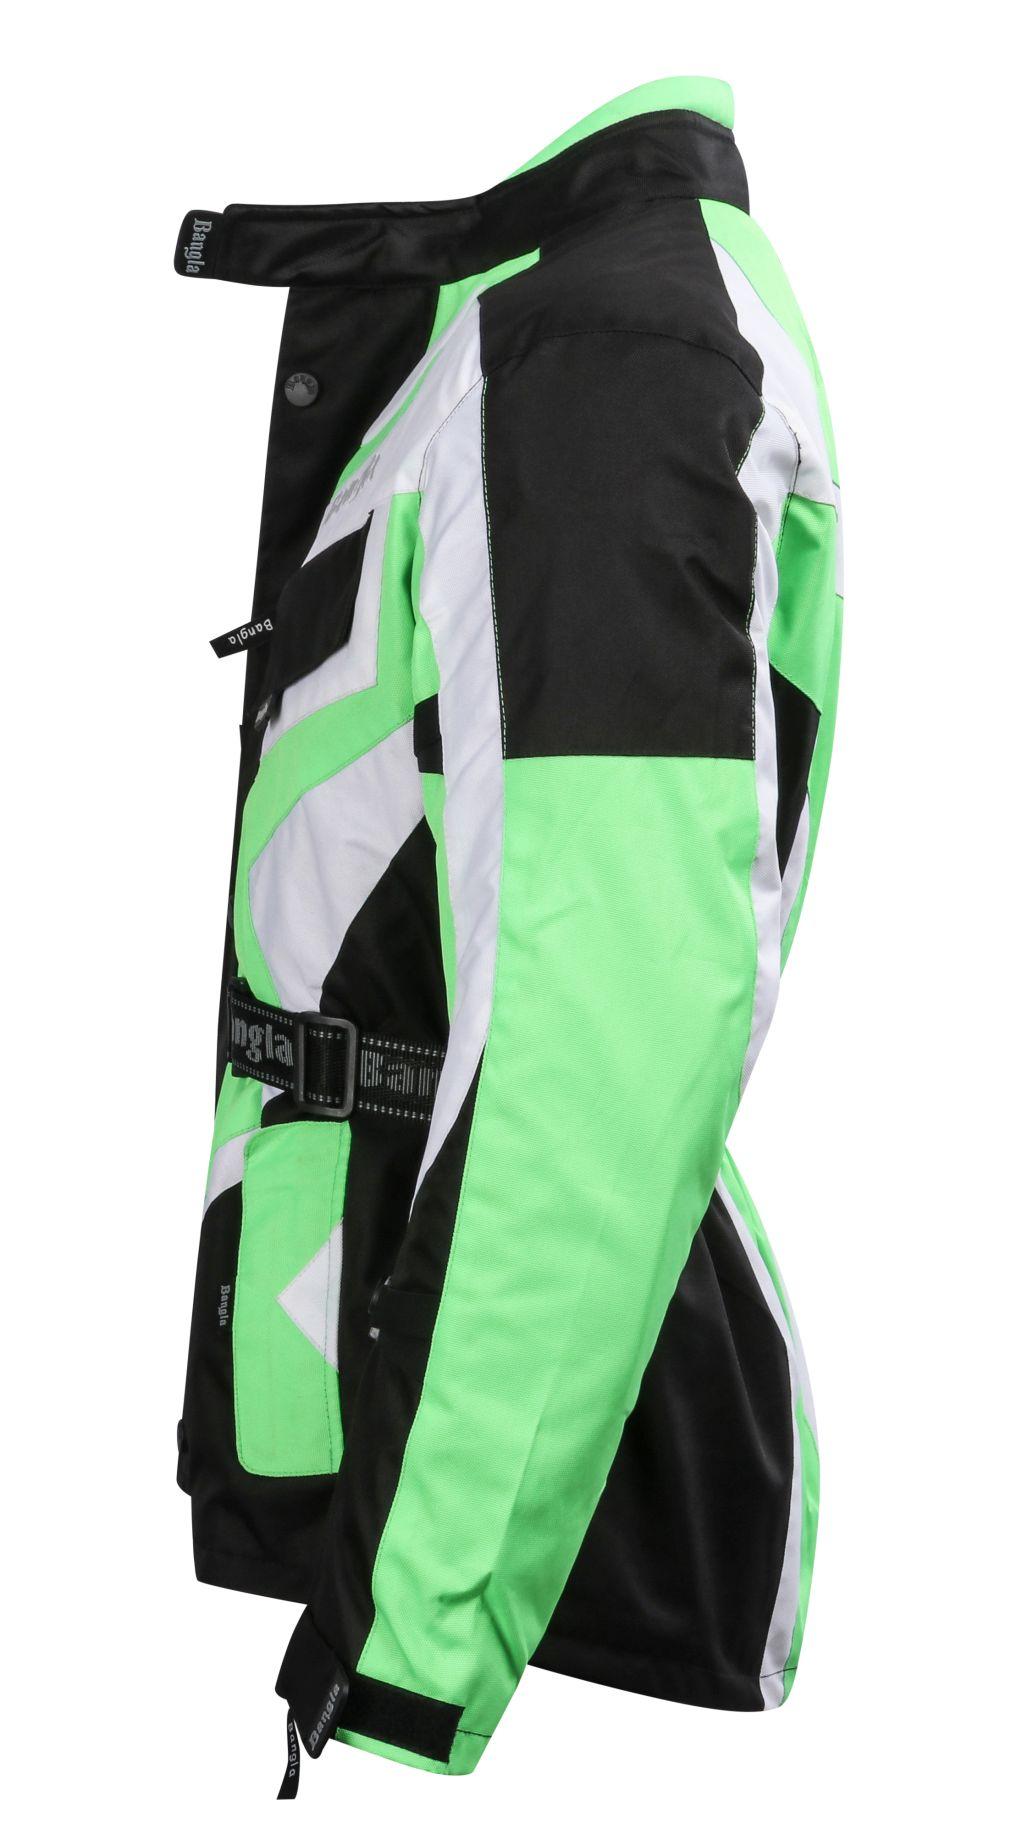 Bangla Motorrad Jacke Motorradjacke Textil Cordura grün schwarz weiss M  - 6 XL